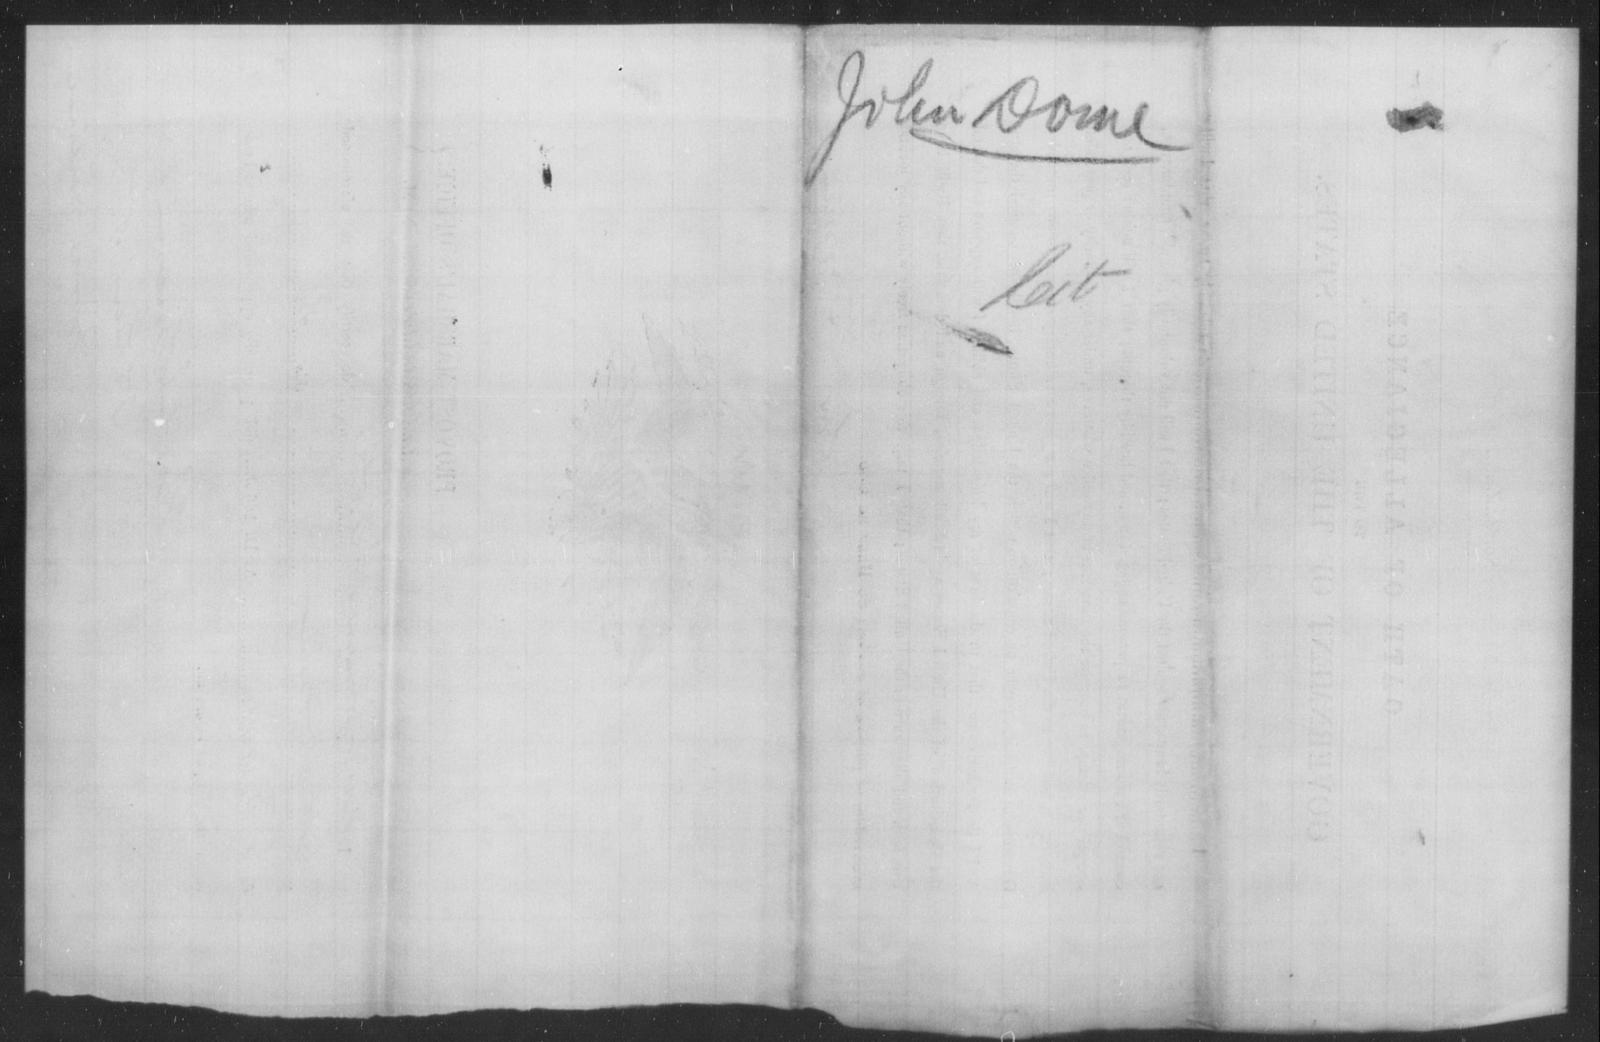 Dome, John - State: [Blank] - Year: 1863